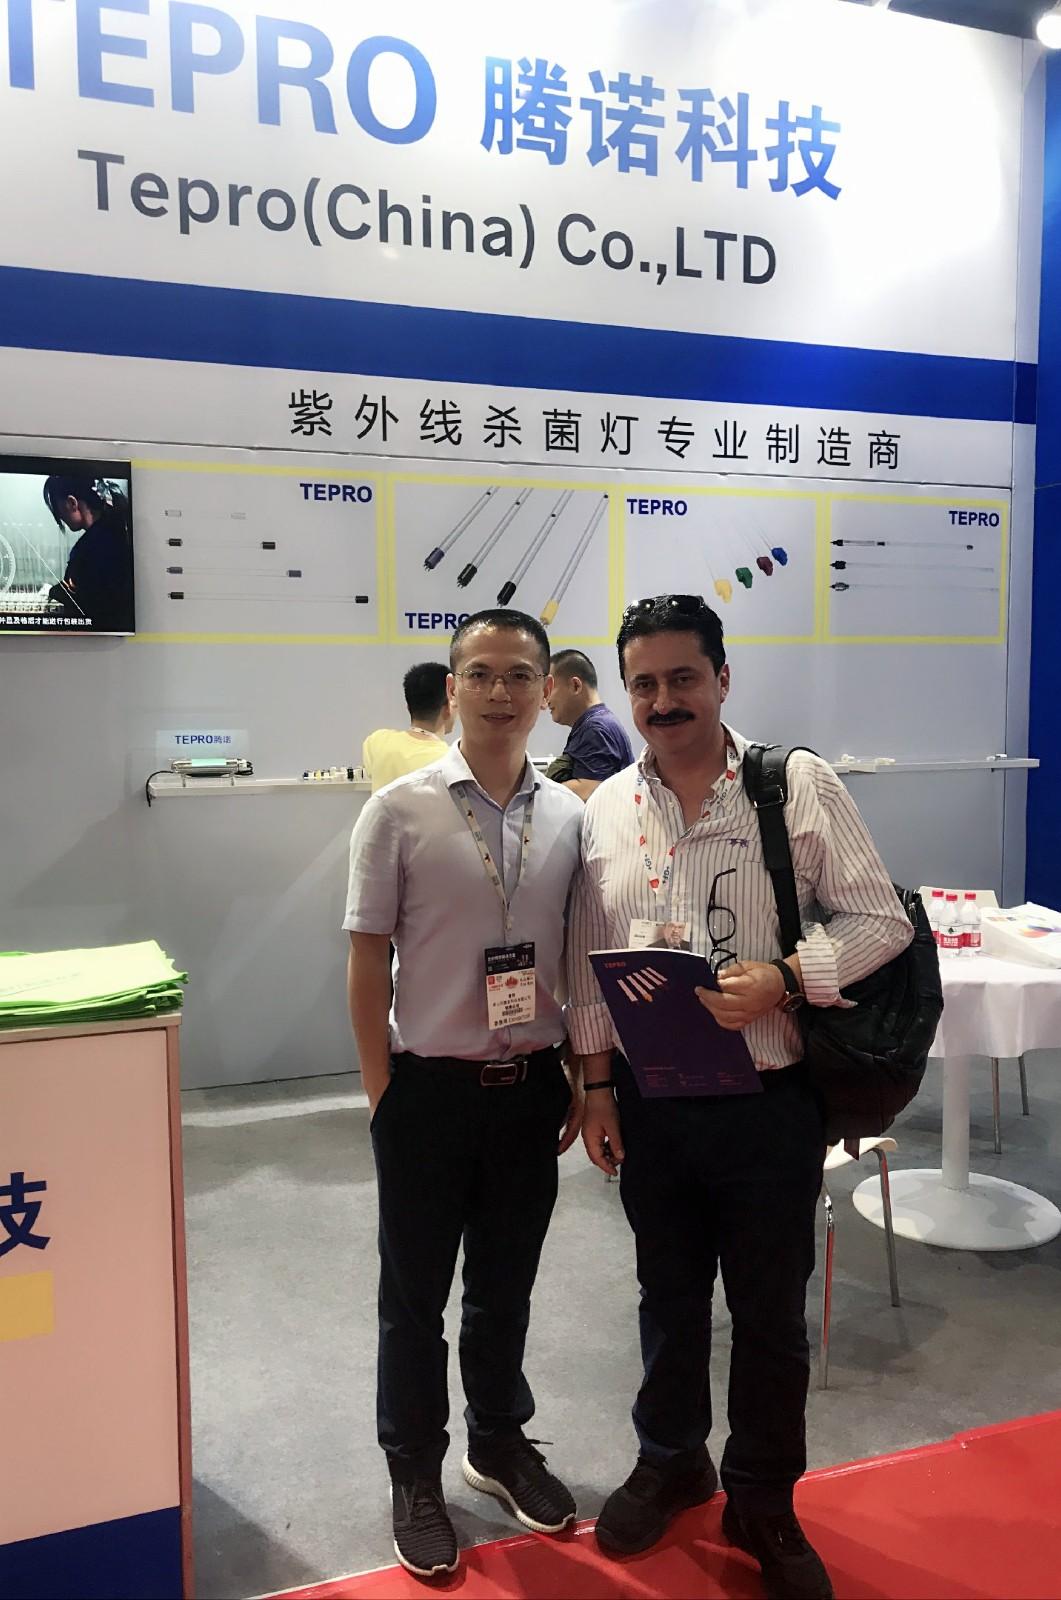 Tepro-Aquatech China Environment 2019 In Shanghai, Tepro china Co, Ltd-1